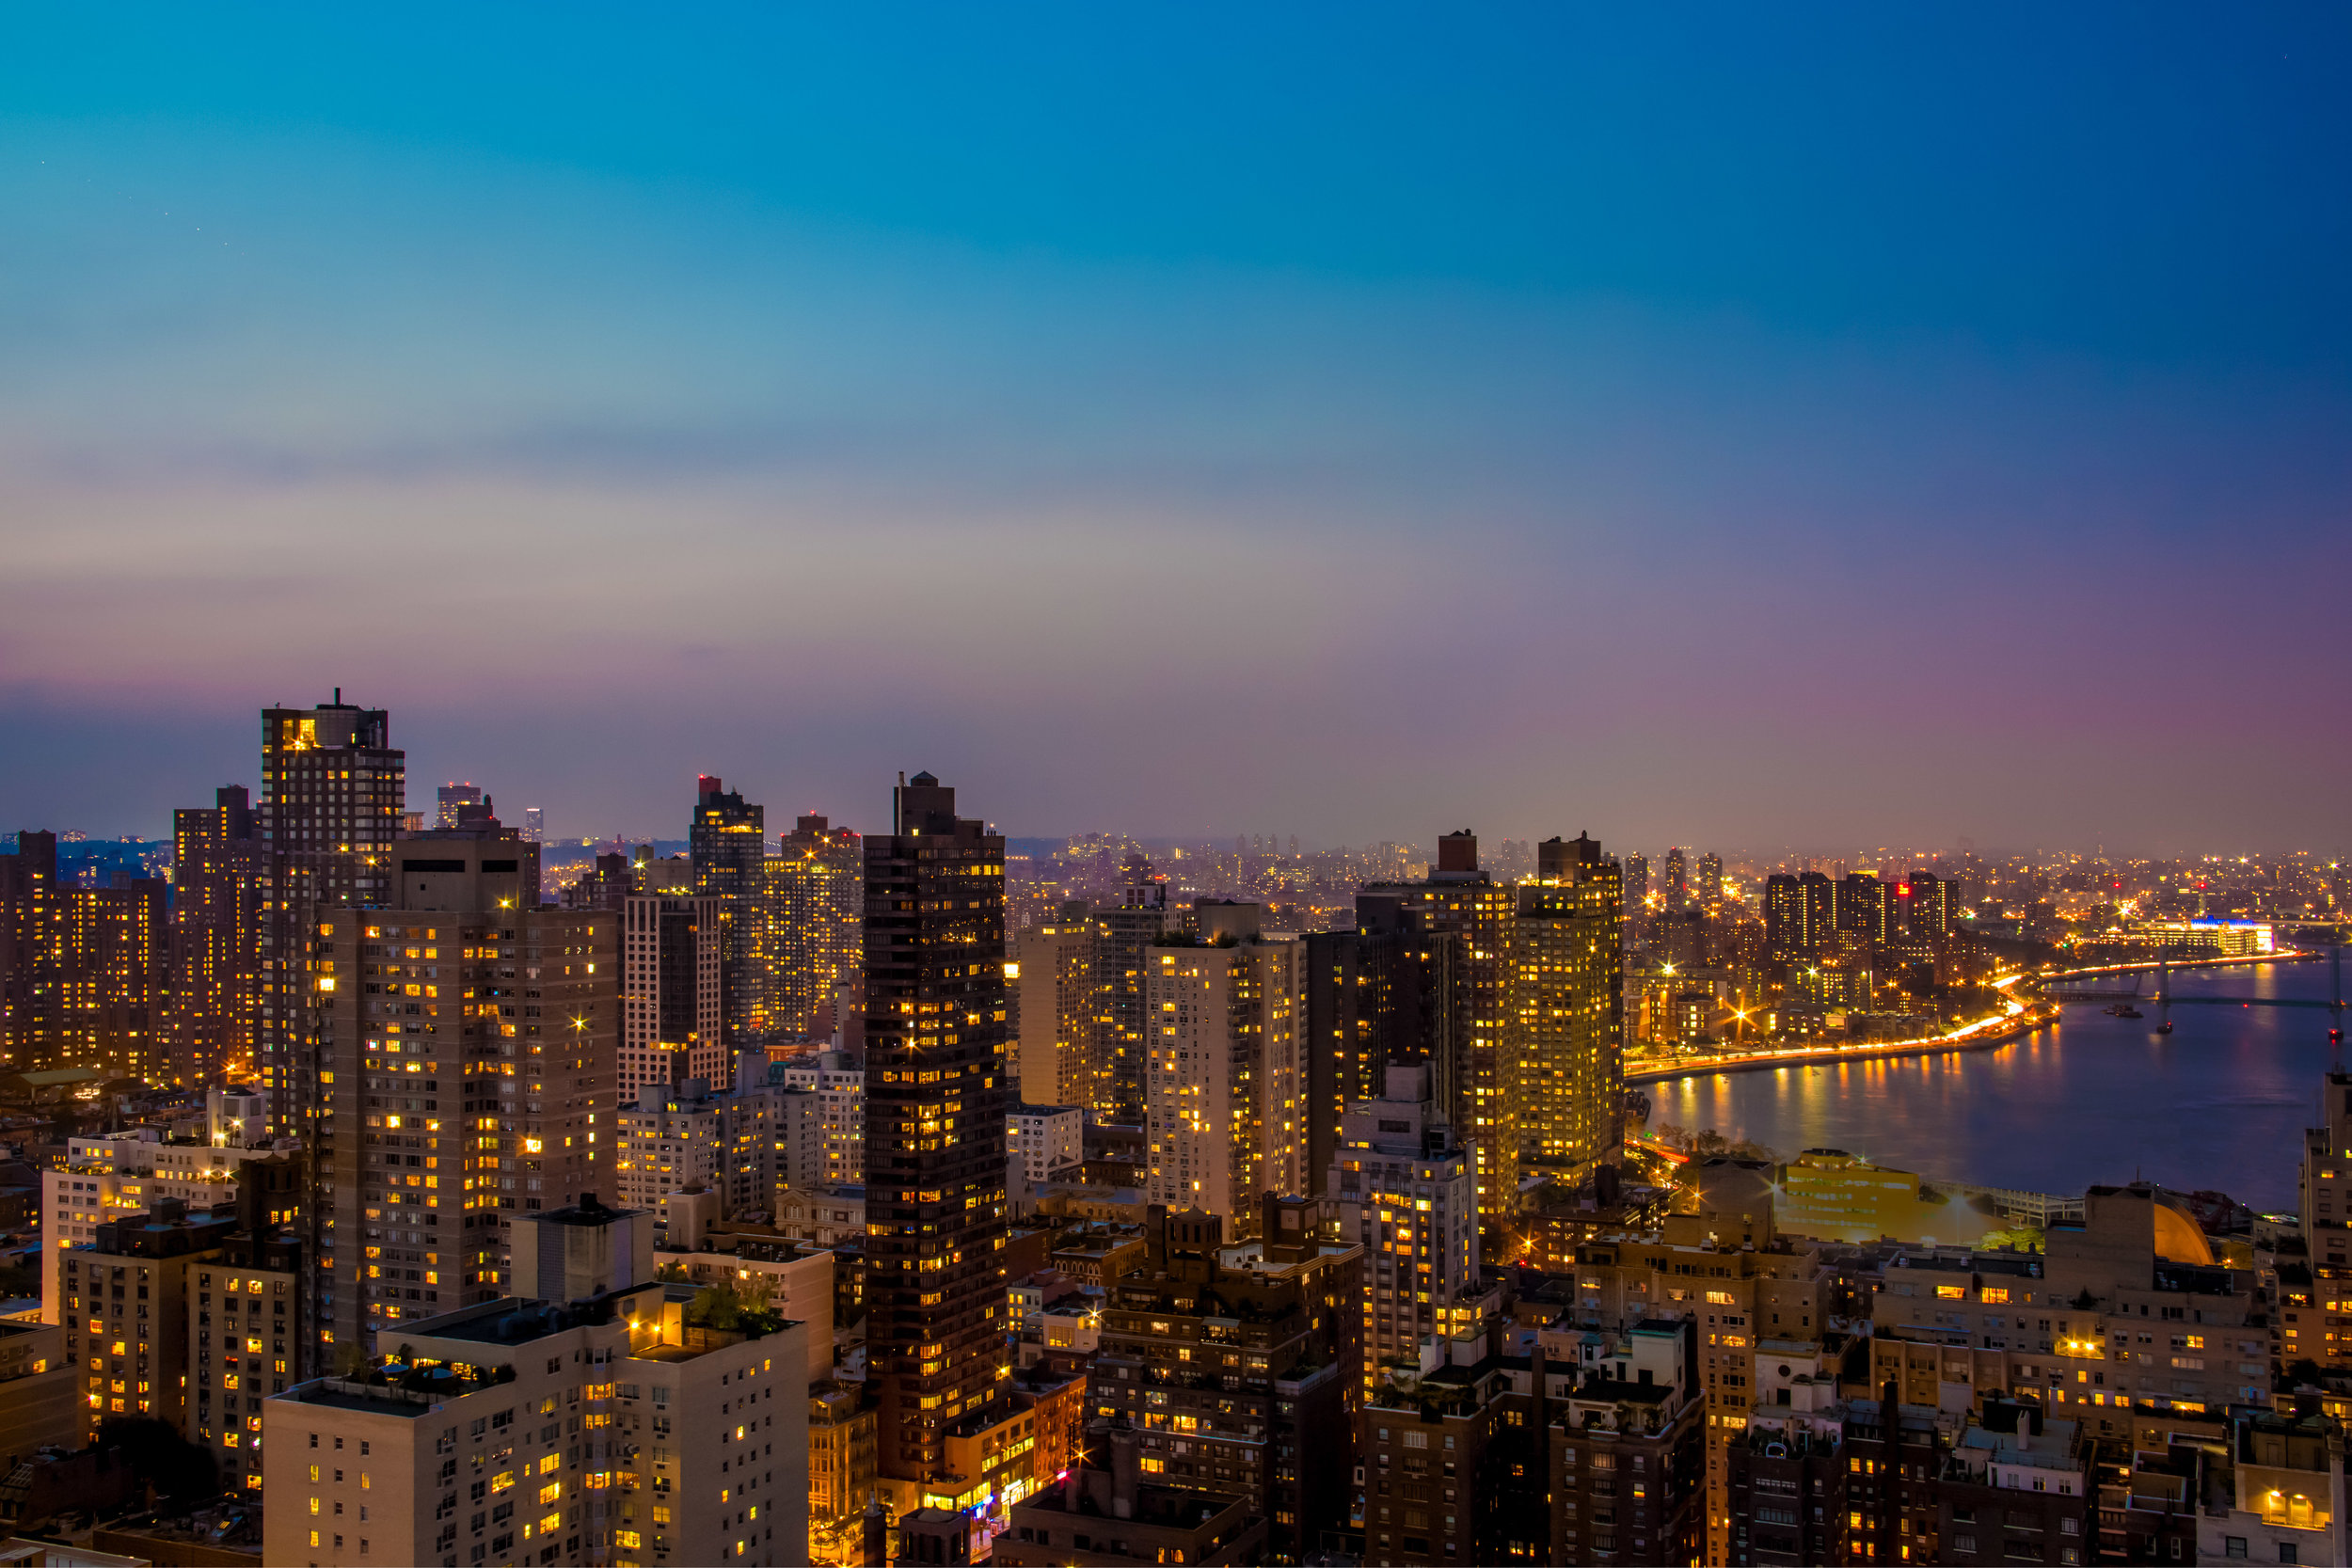 LSNY_Night_City_Views-9.jpg